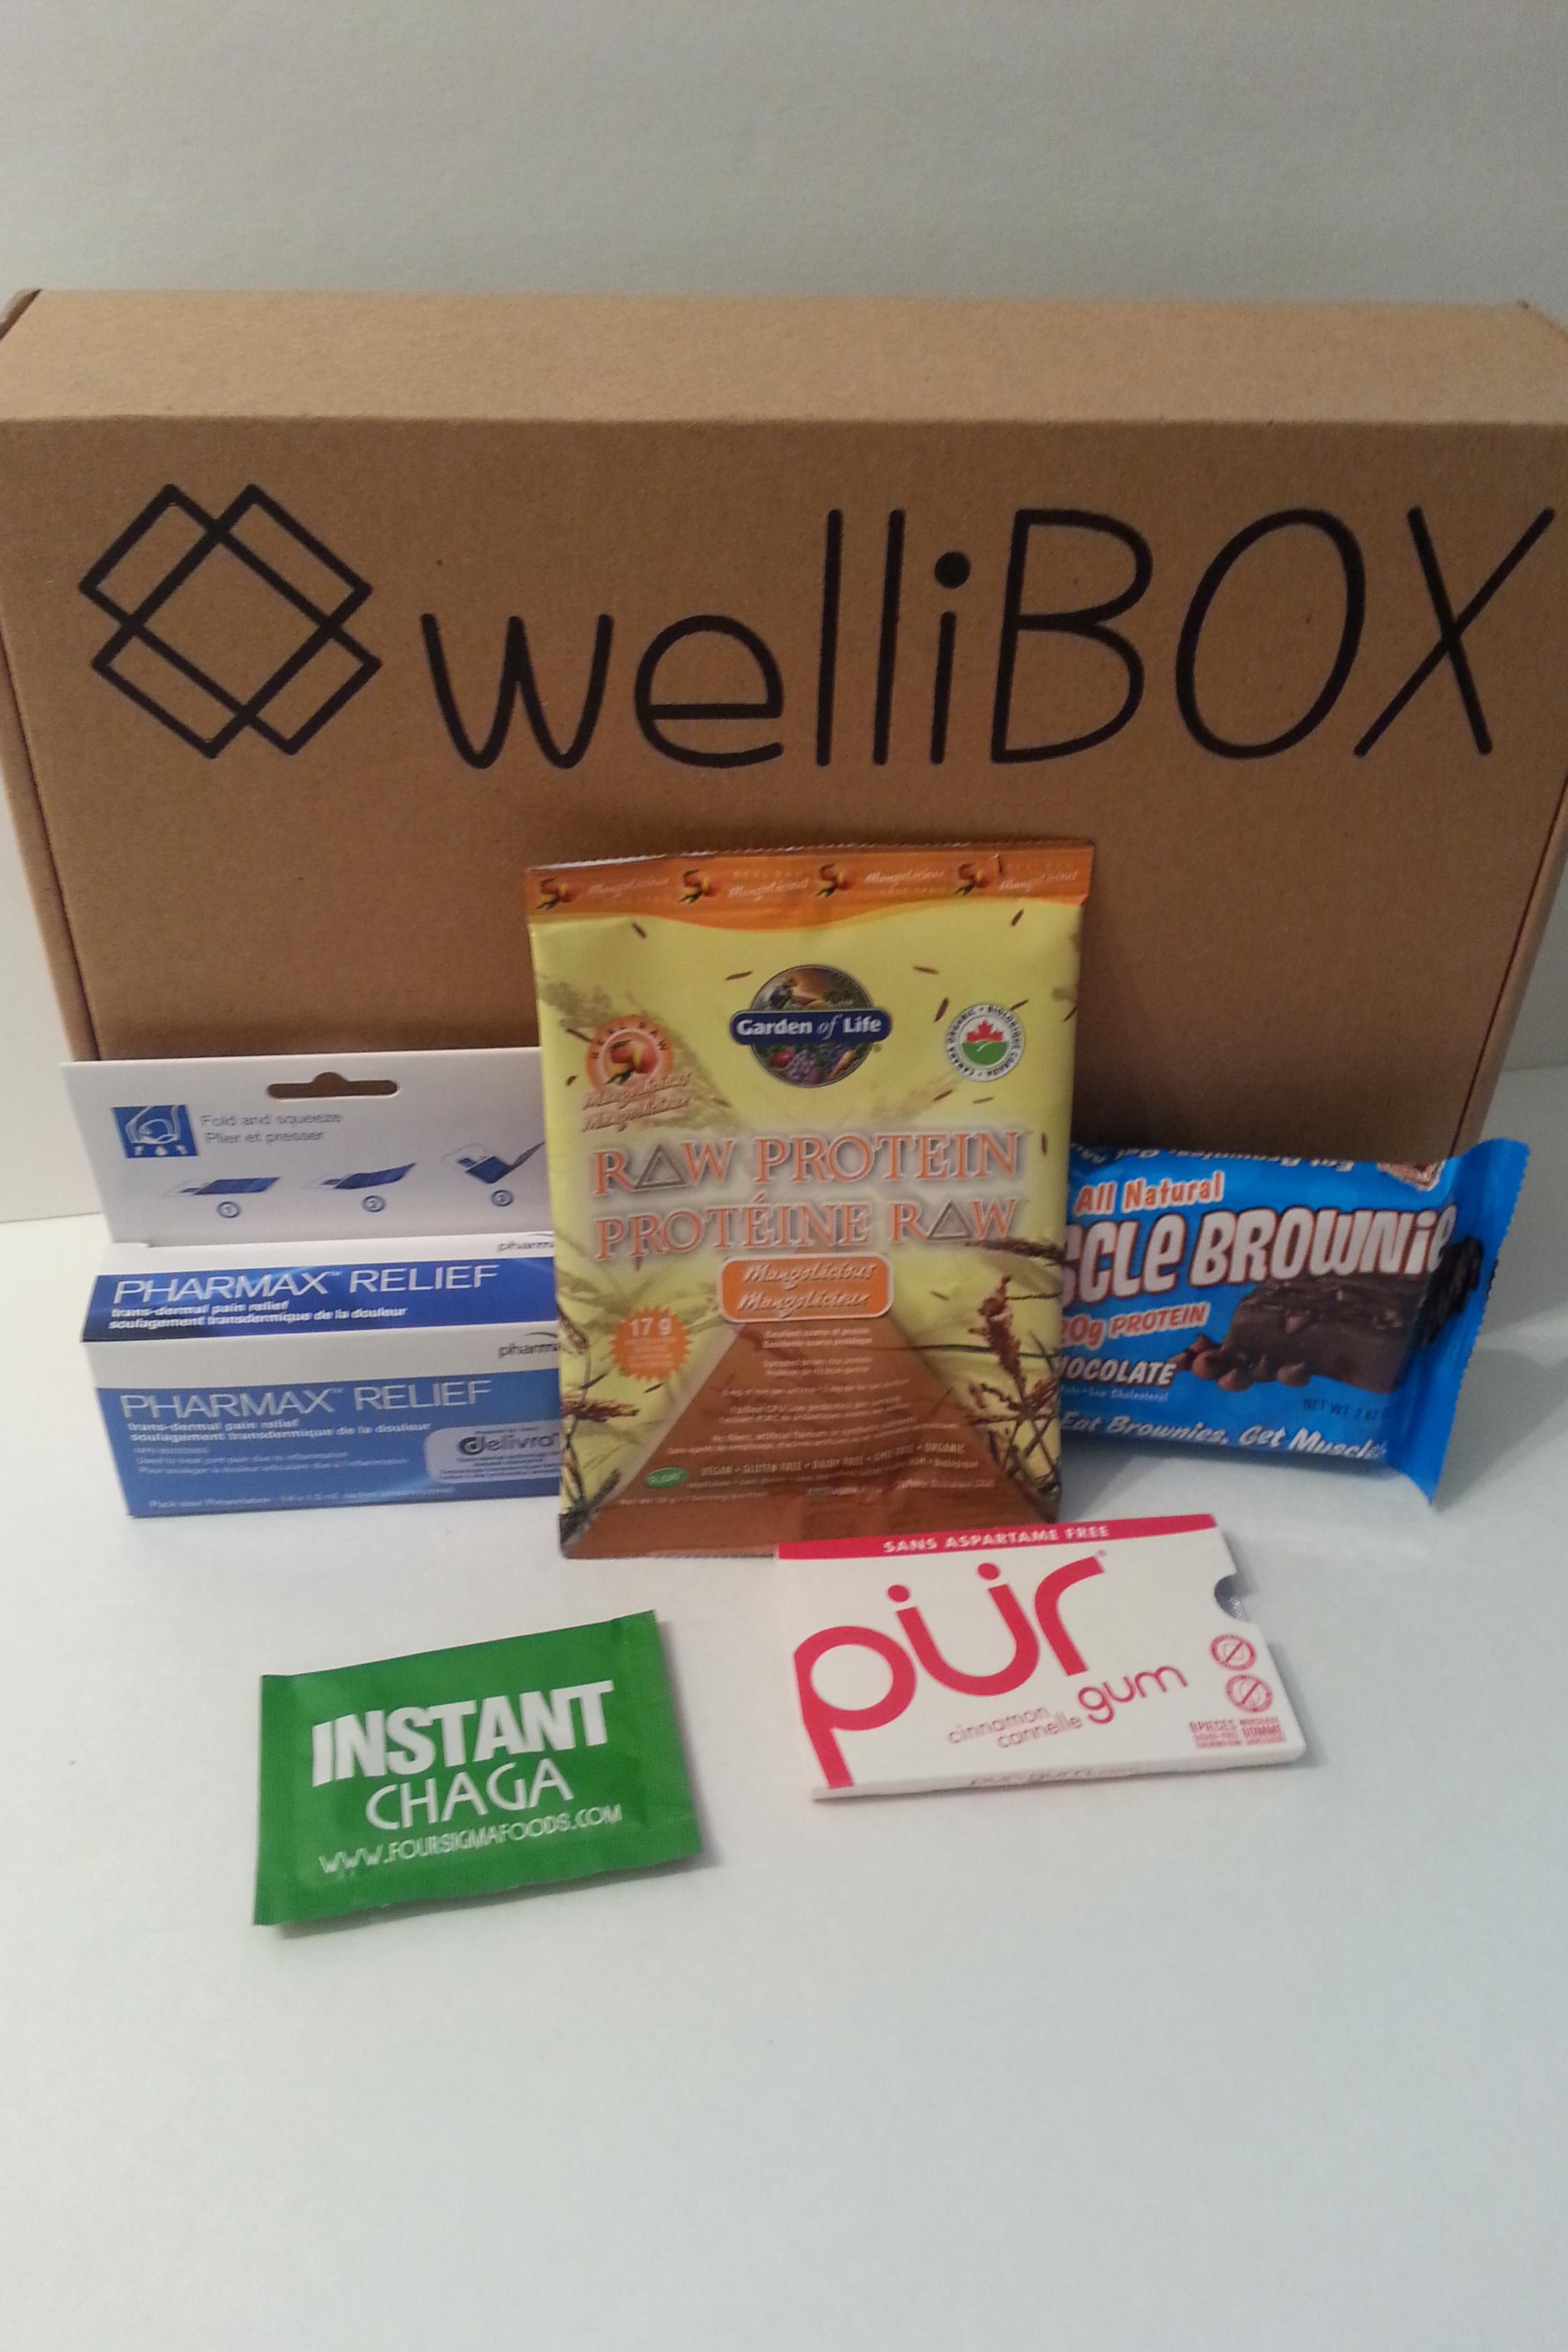 July | 2015 | A Newly Minted Sub Box Addict